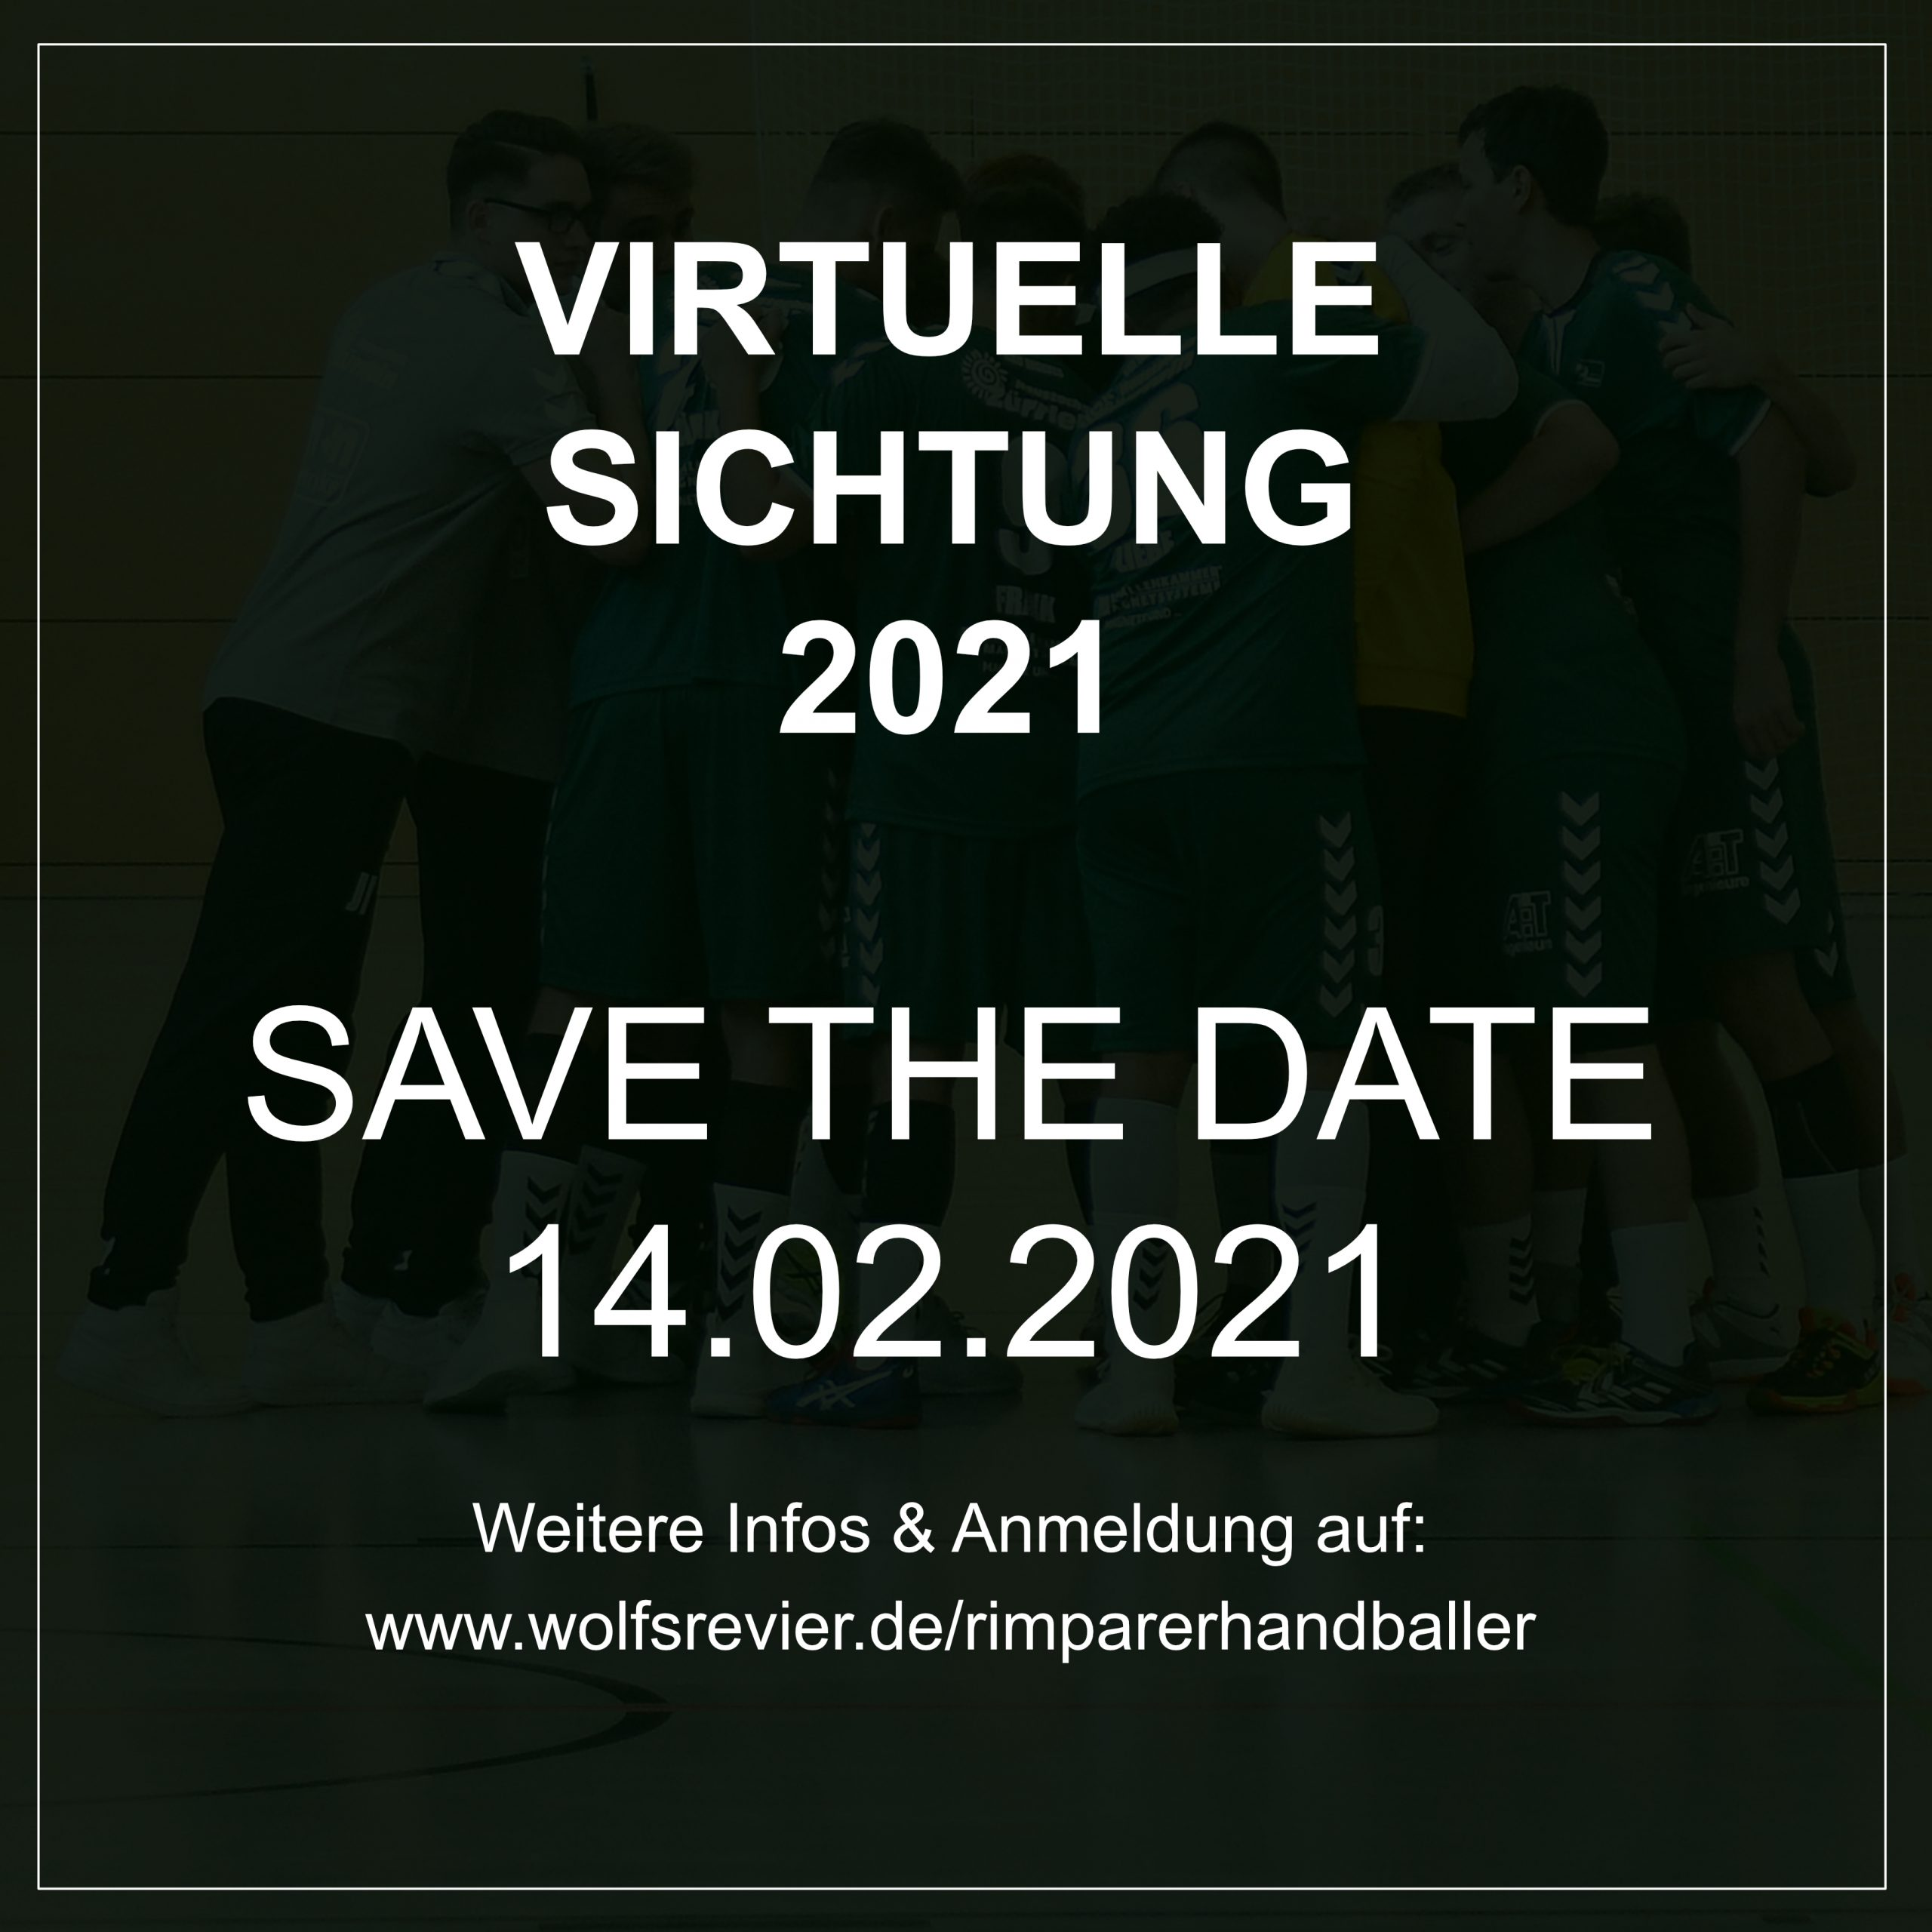 Virtuelle Sichtung 2021